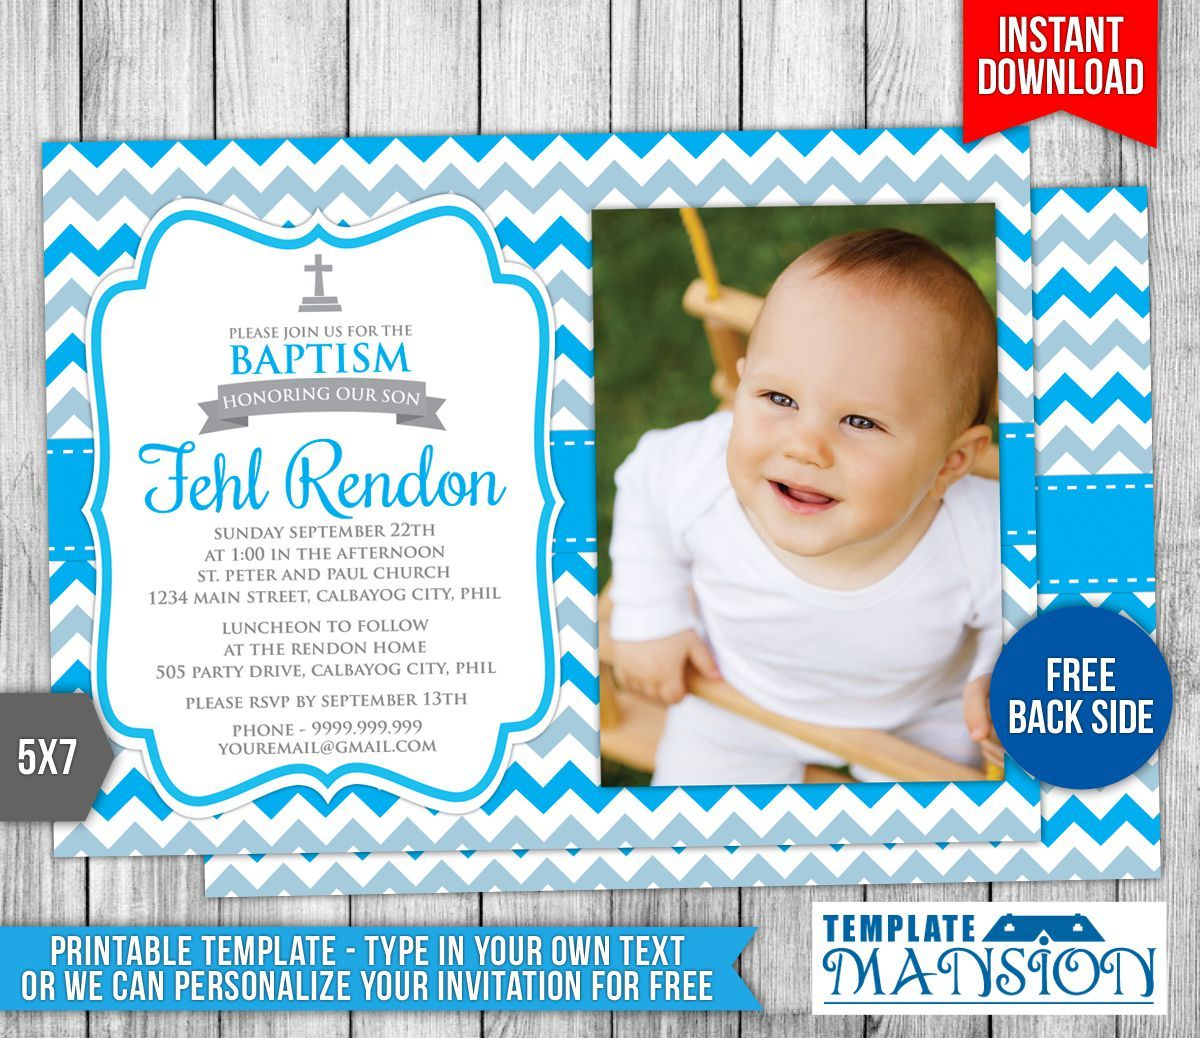 Boy baptism invitations baptism invitations pinterest boy baptism invitations stopboris Images